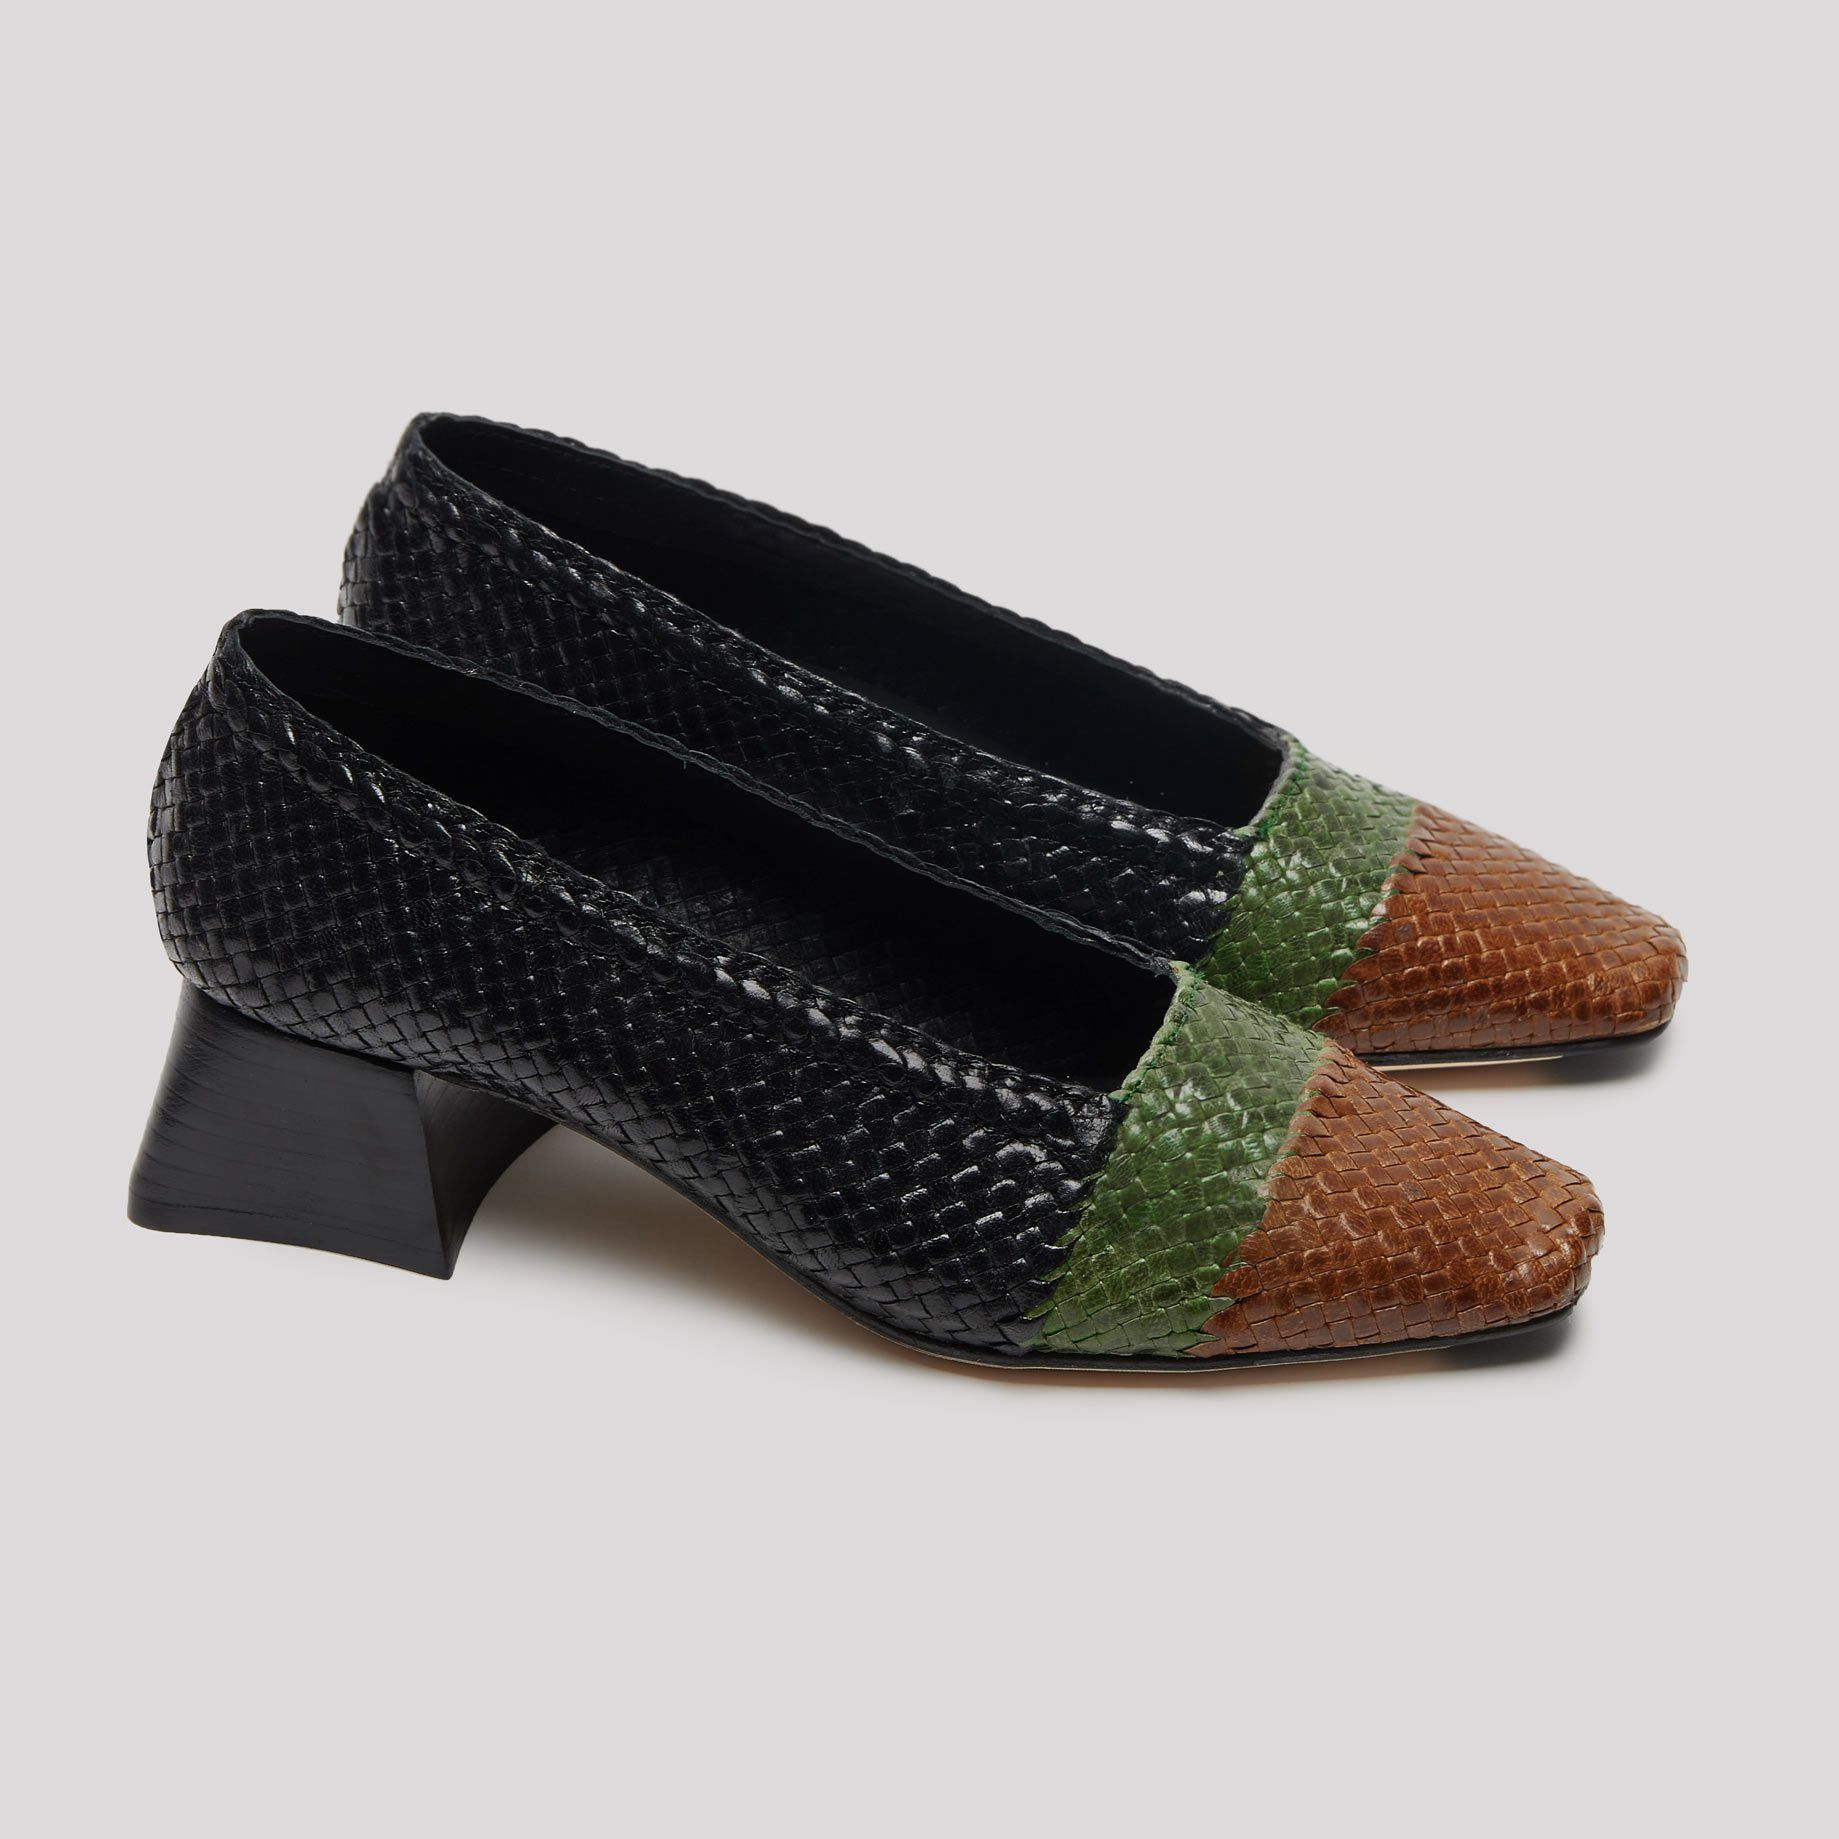 56a2834978893 Eivissa Black Mix Heels Leather Heels, Calf Leather, Soft Leather, Long  Shirt Dress